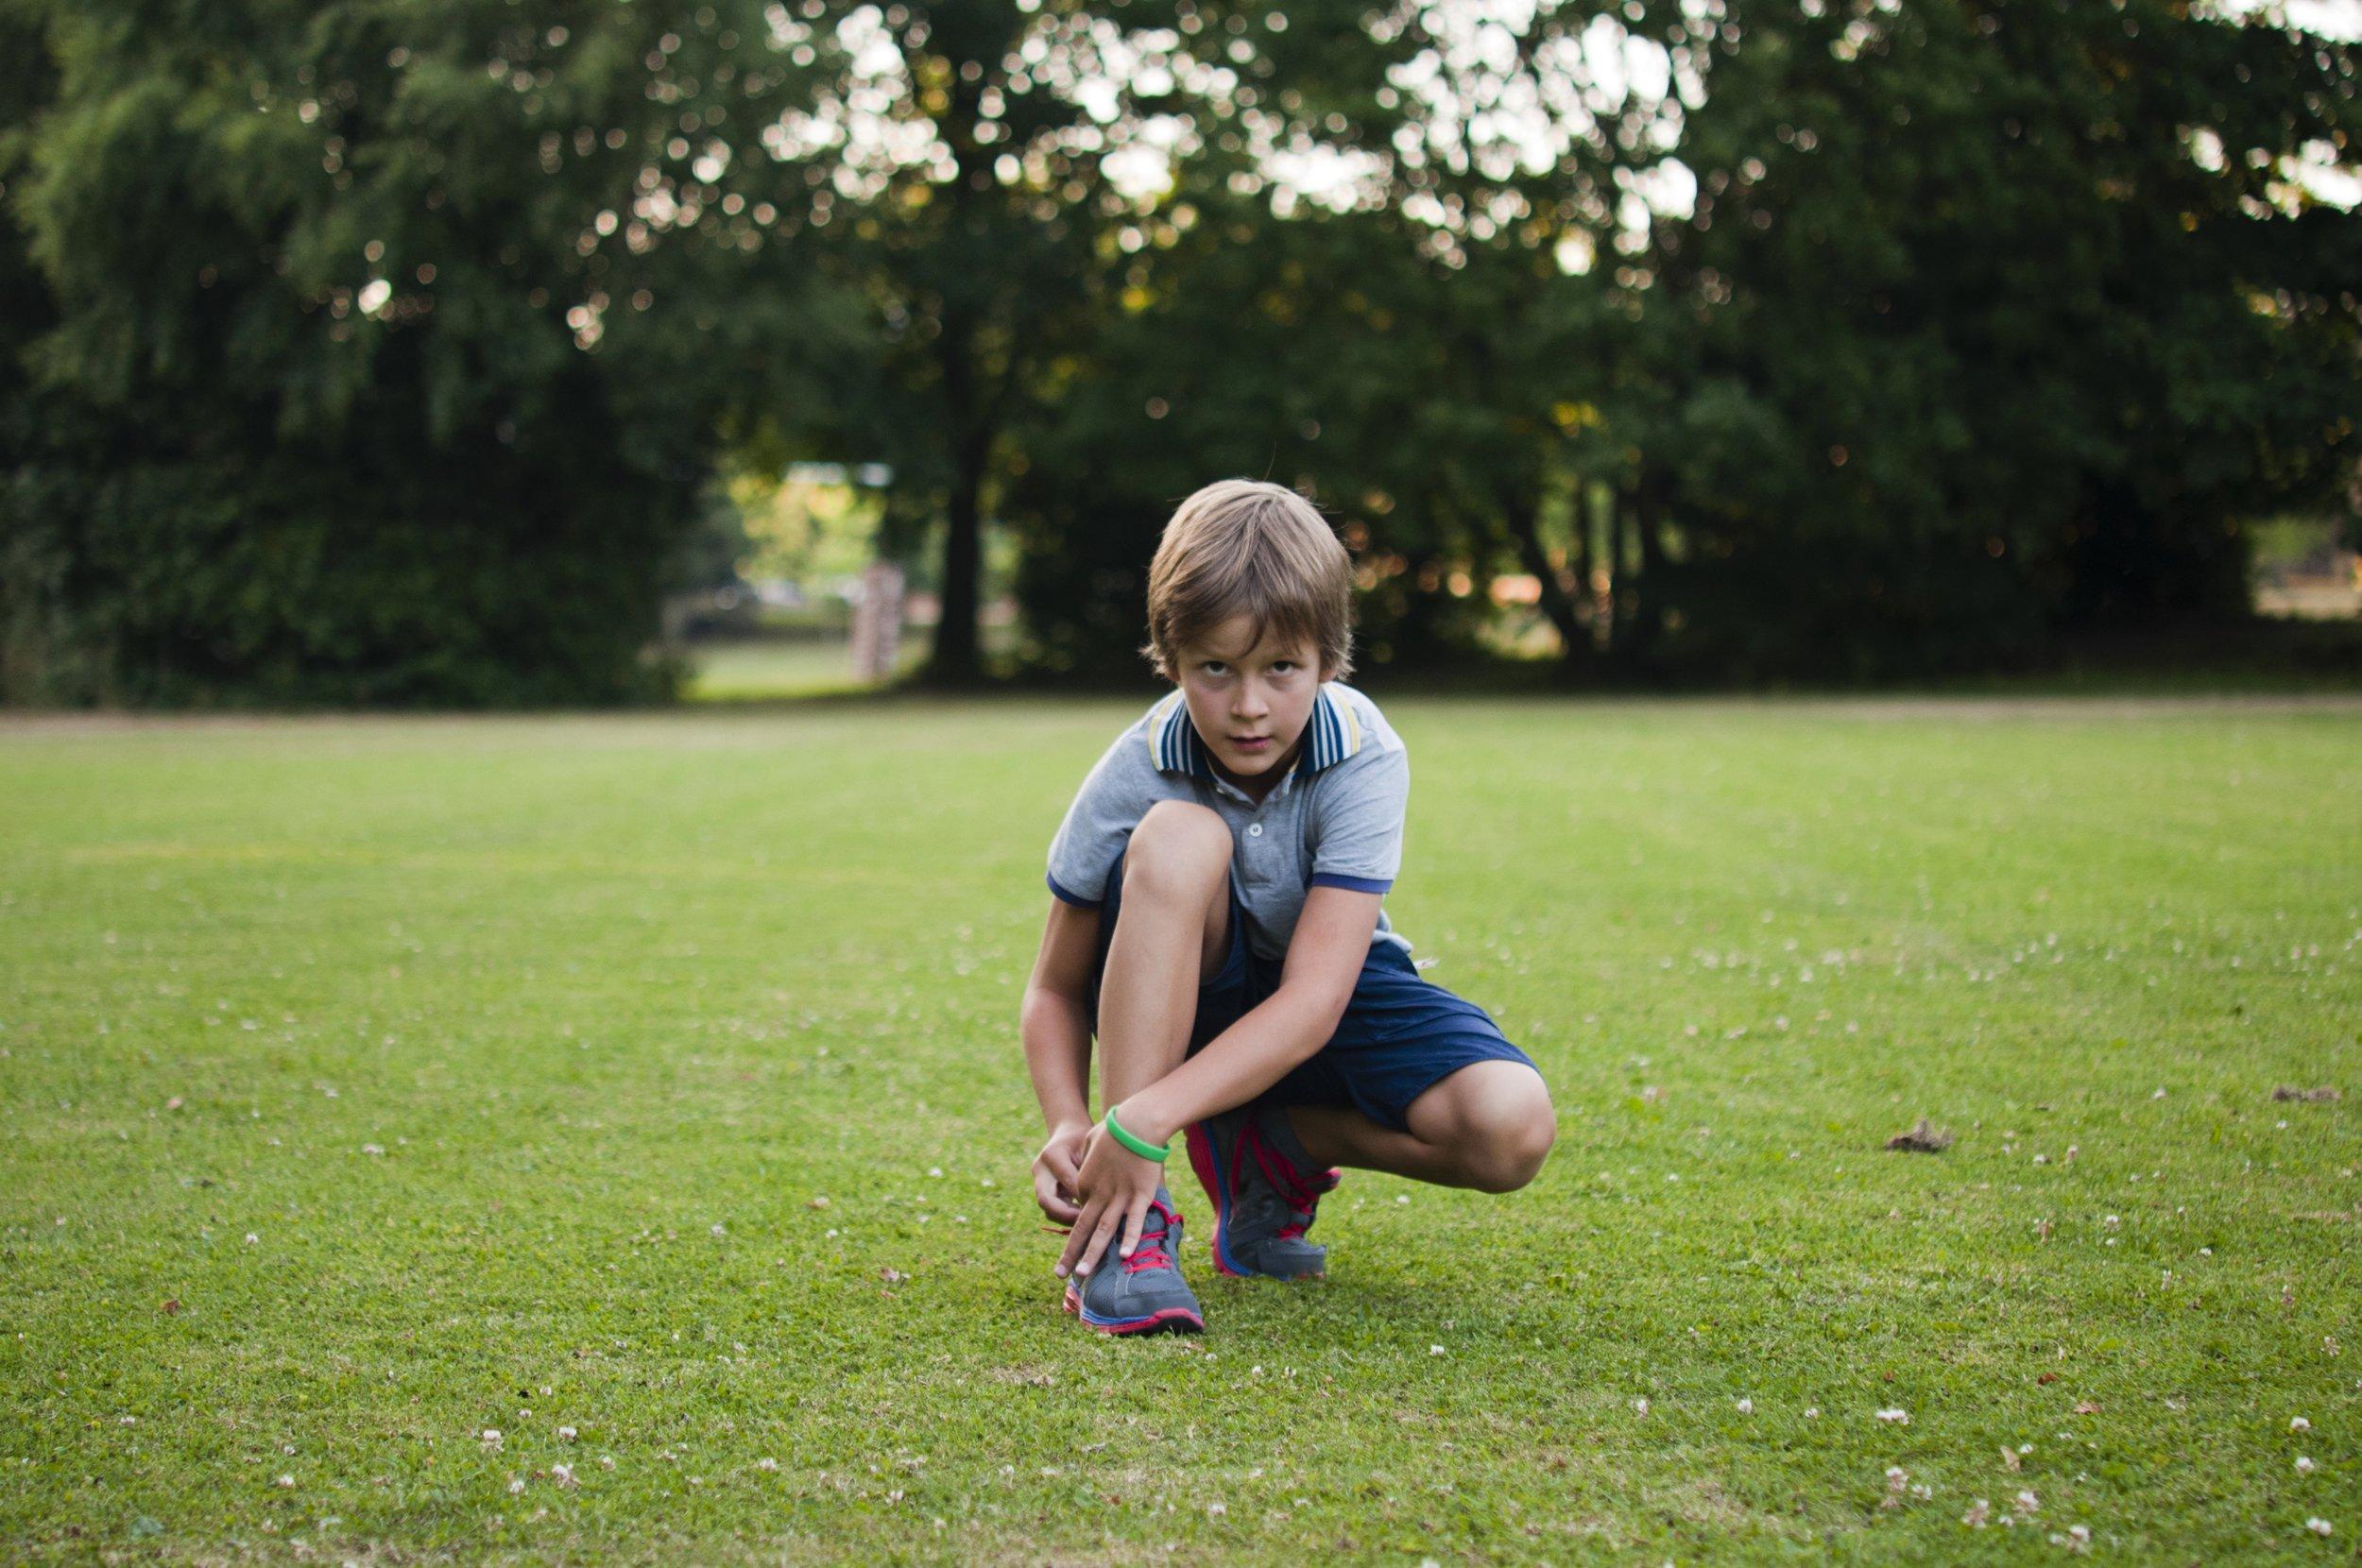 Johann tying his shoelaces, 2013